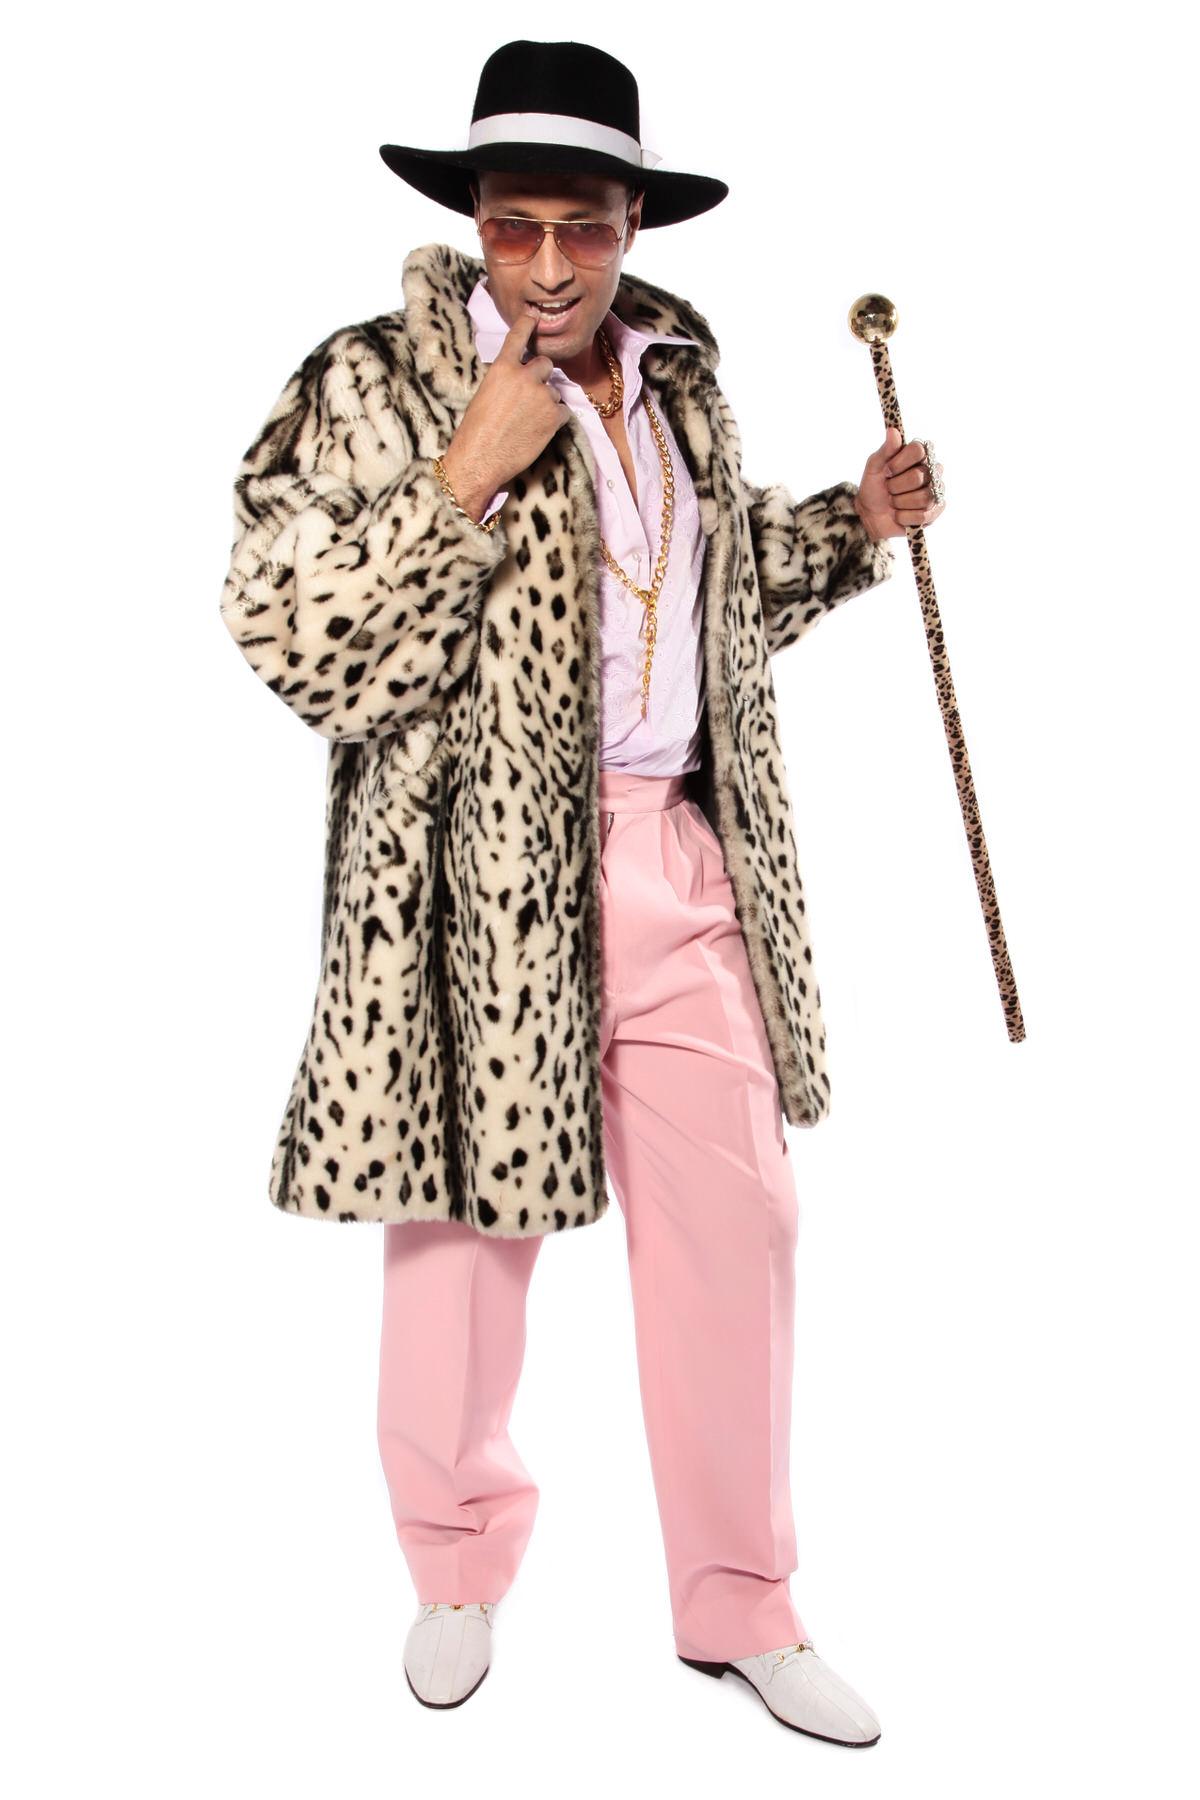 70s PIMP COSTUME W LEOPARD PRINT COAT